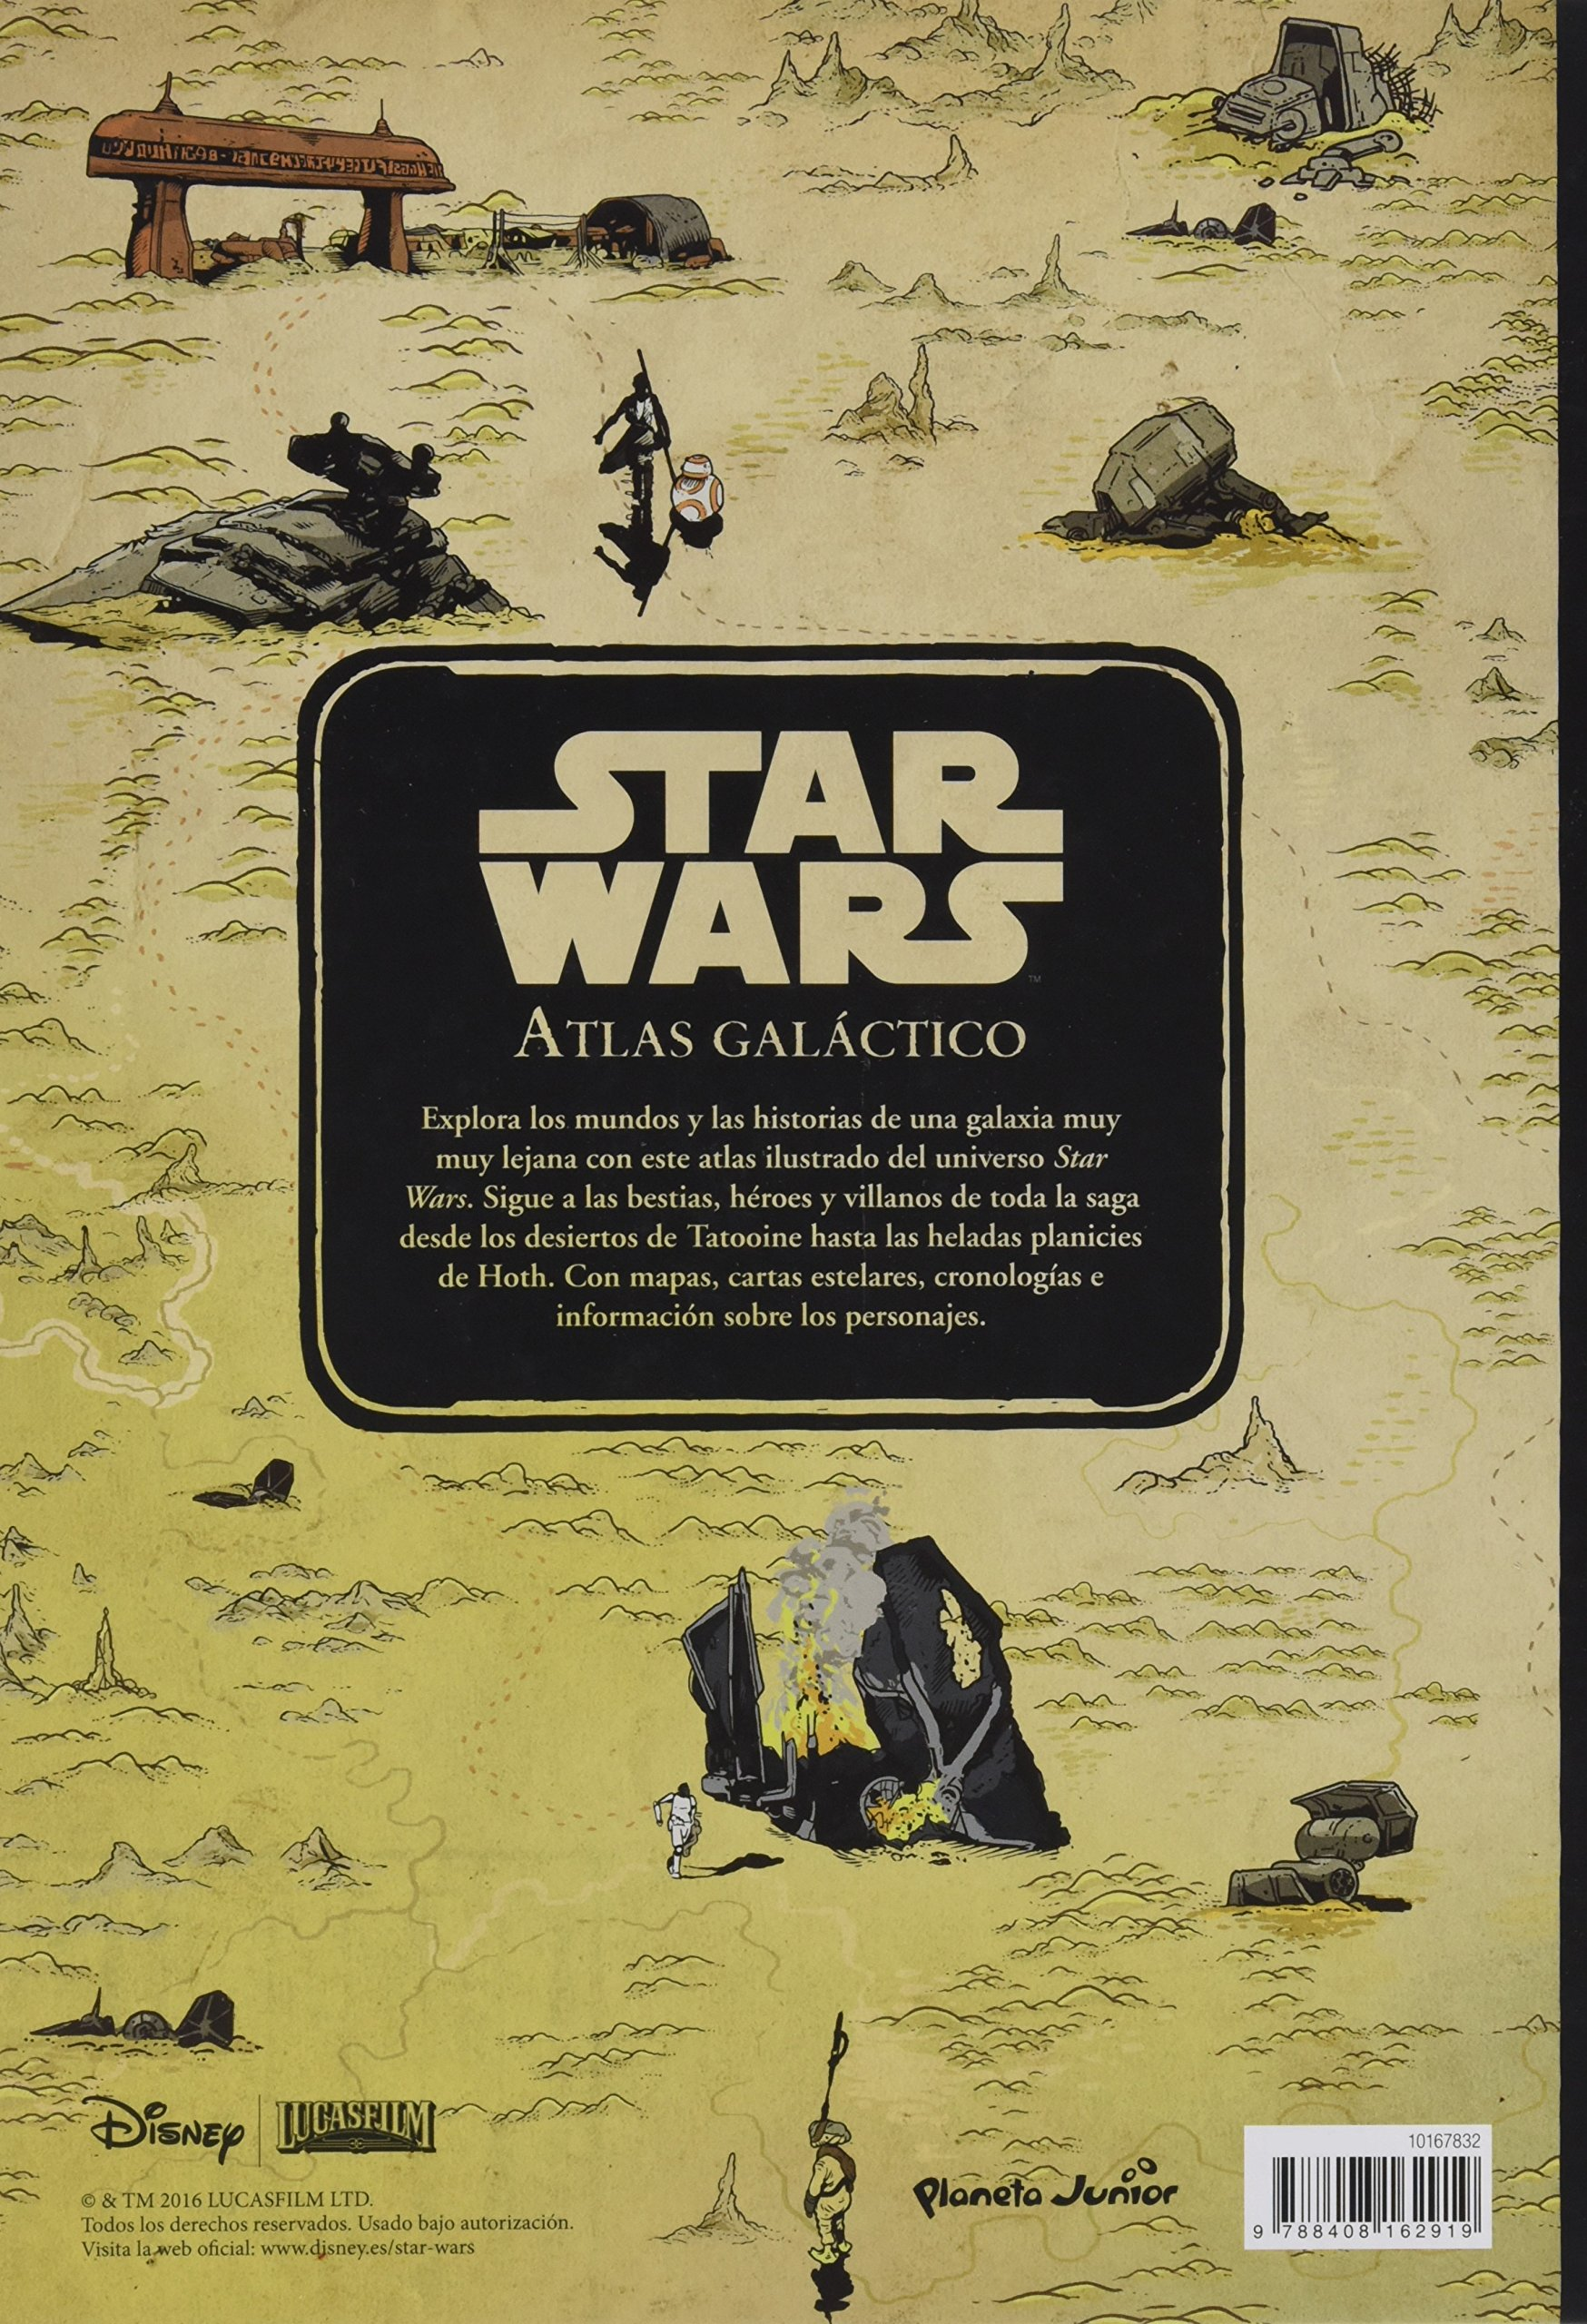 Star Wars. Atlas galáctico: Star Wars: 9788408162919: Amazon ...